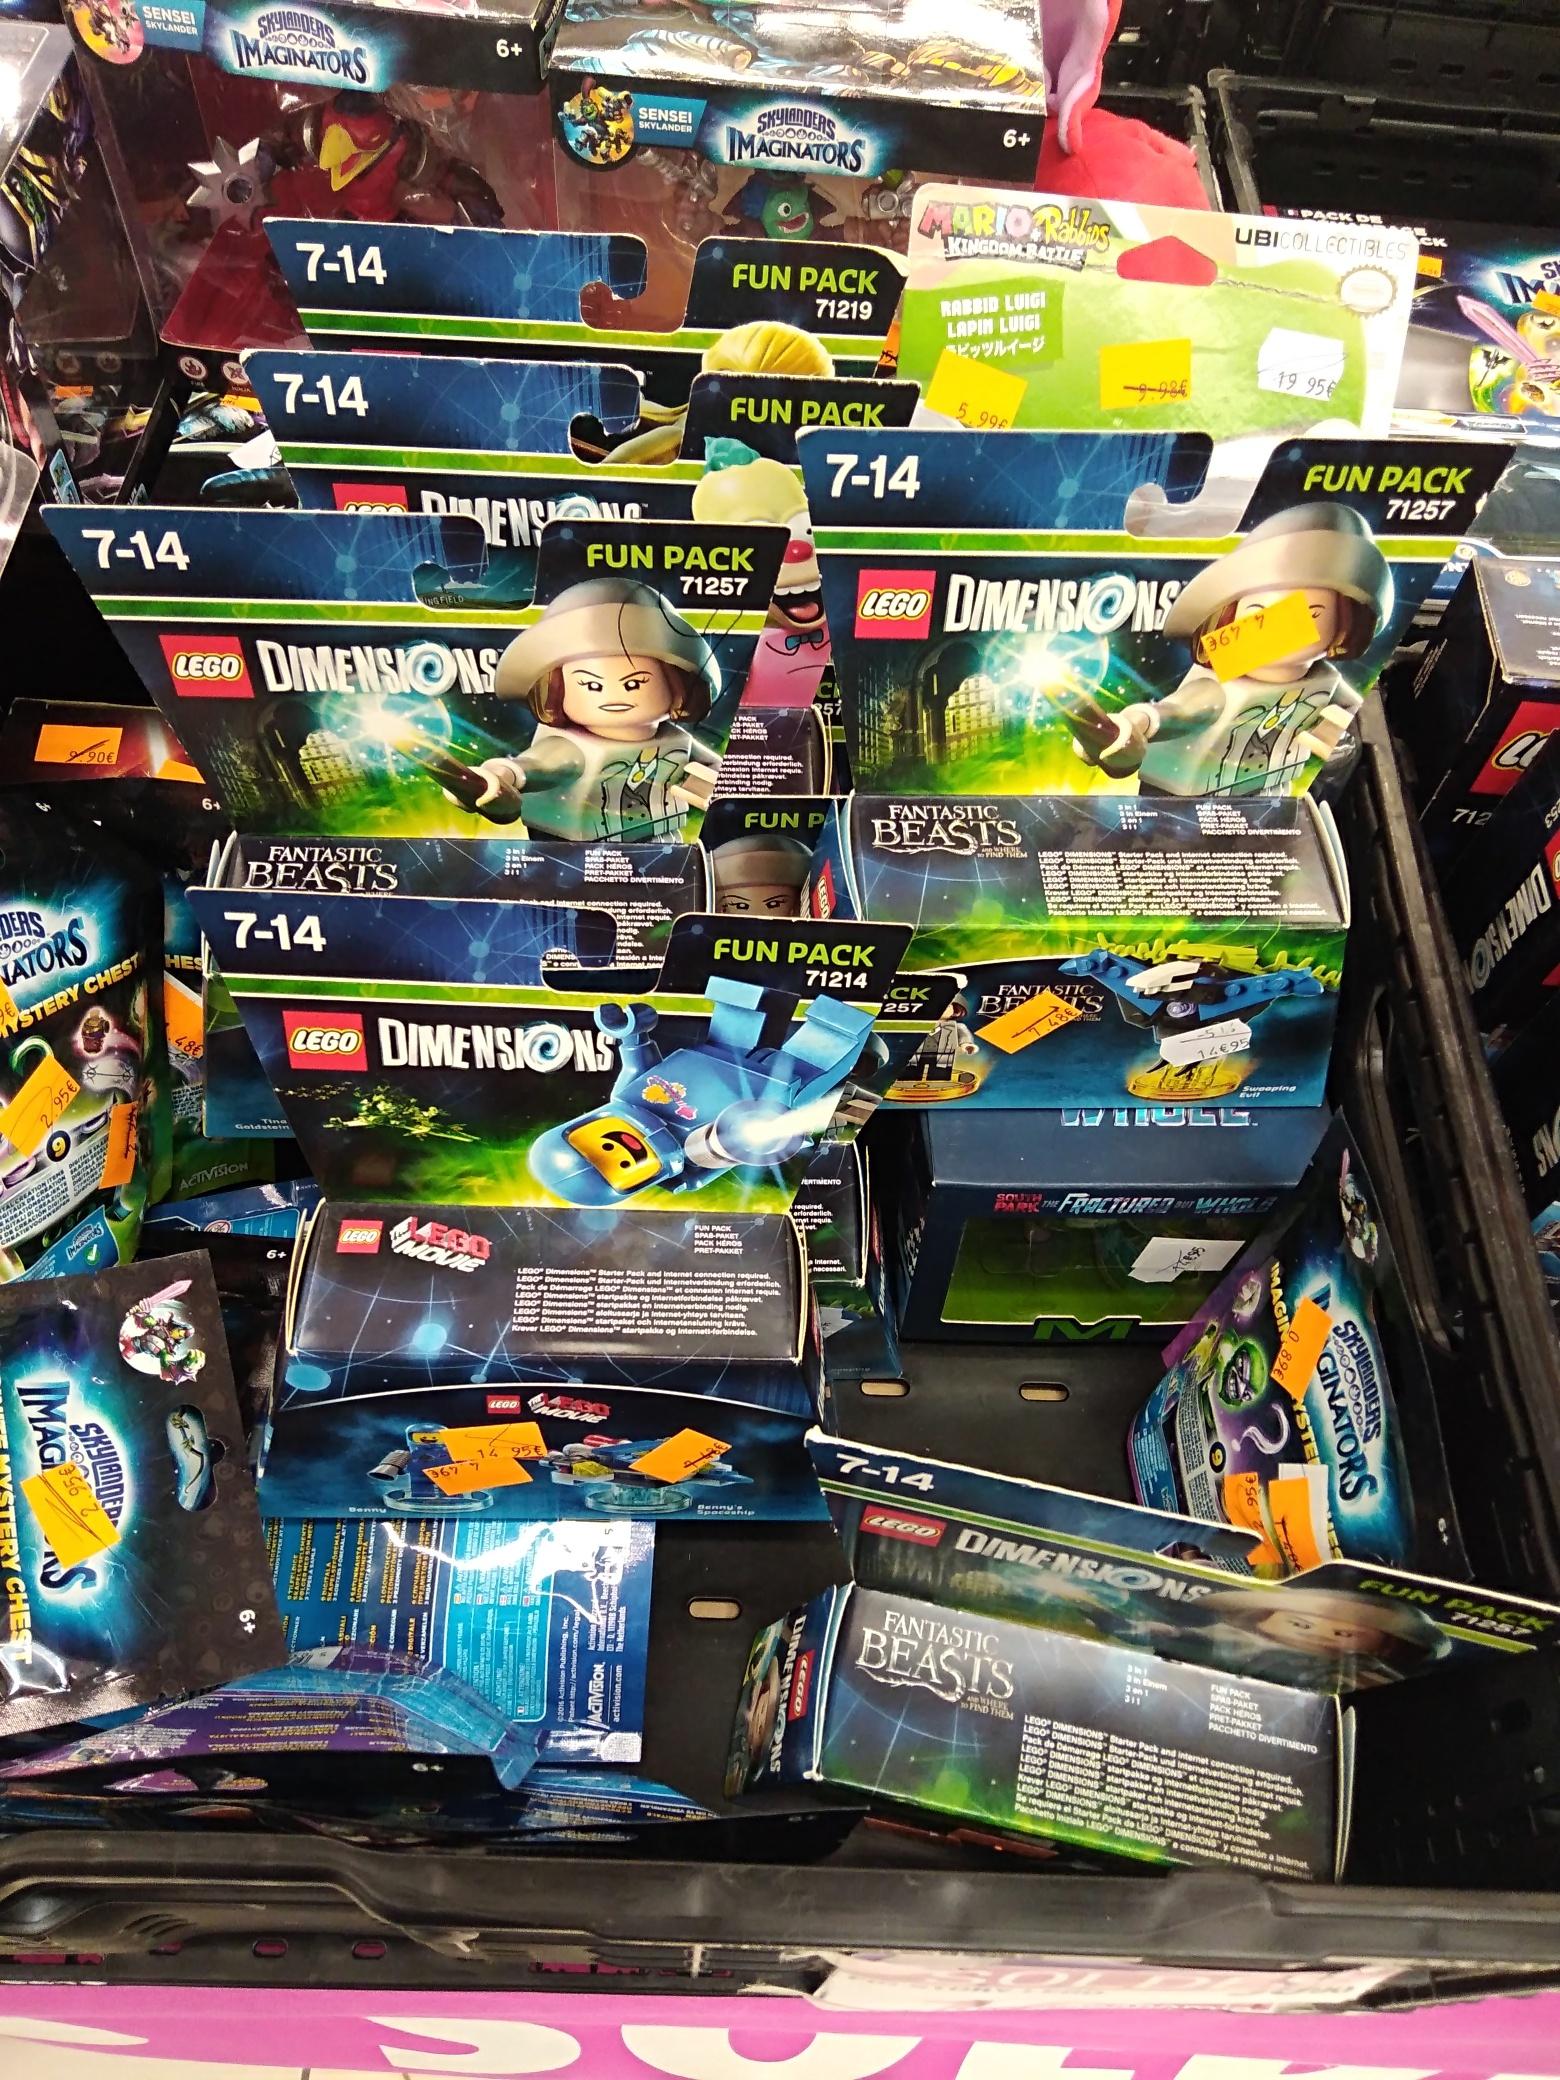 Lego Dimension Fantastic Beasts ou Fun pack (Voiron 38)